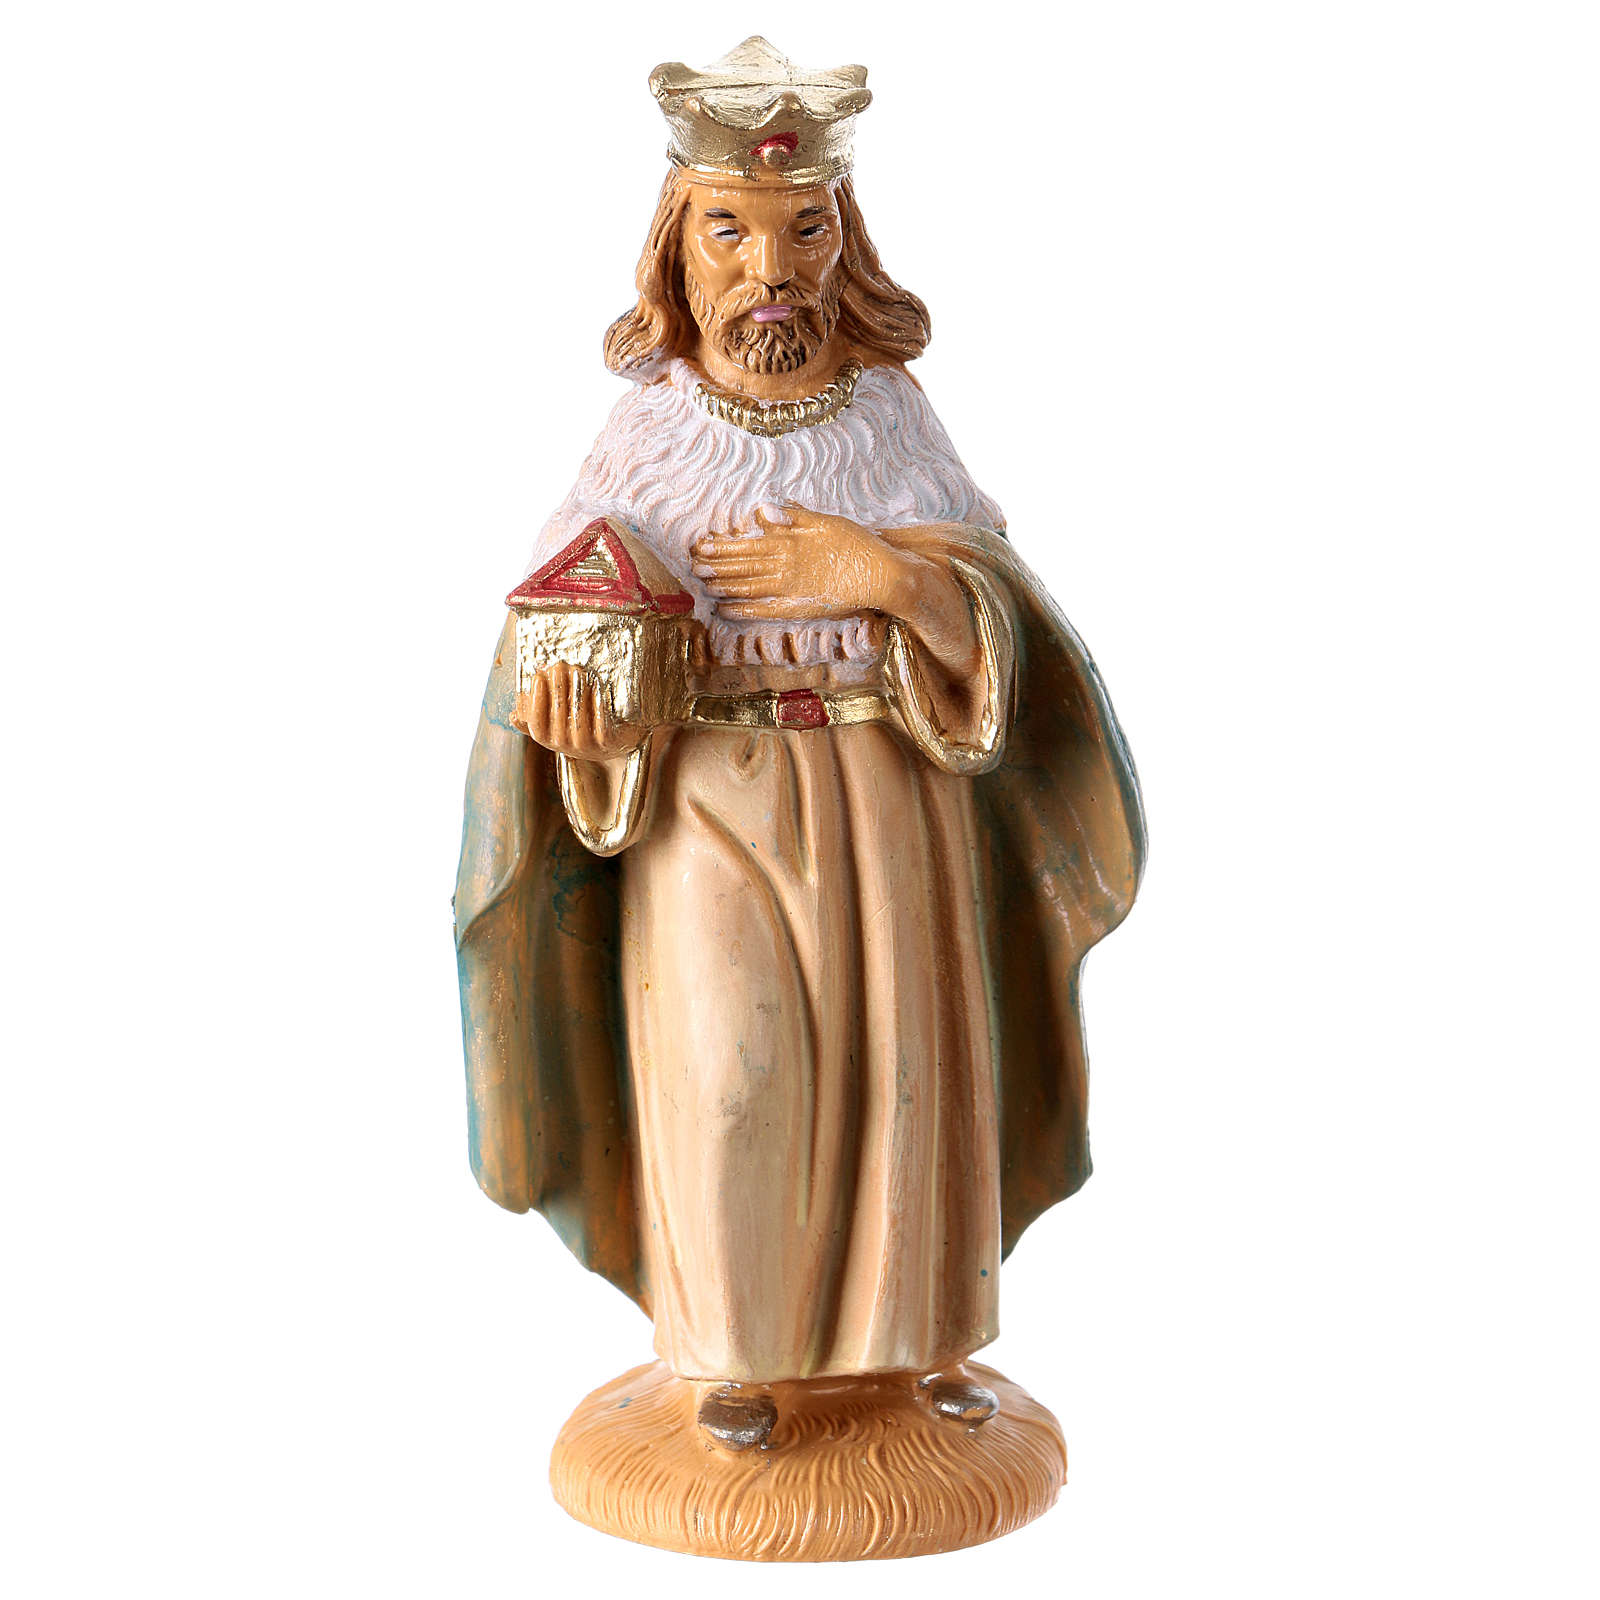 Statua Re Magio Melchiorre 10 cm per presepe 3